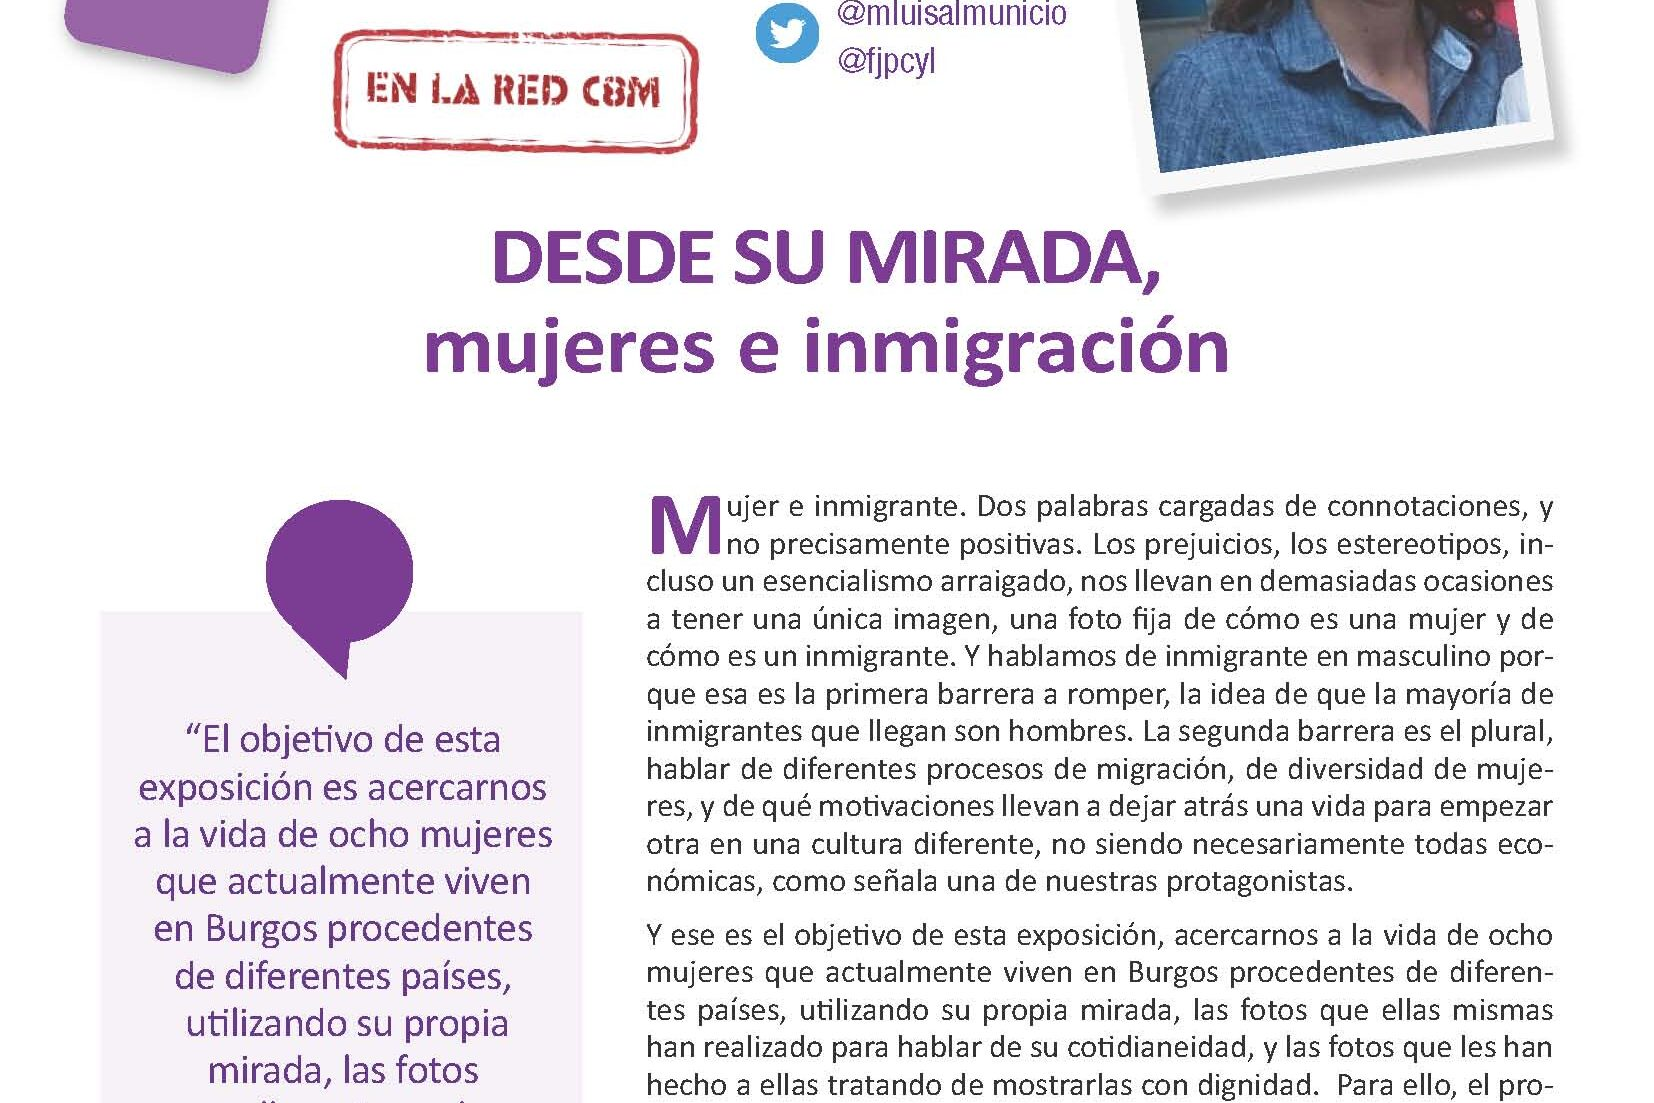 Mujeres e inmigración